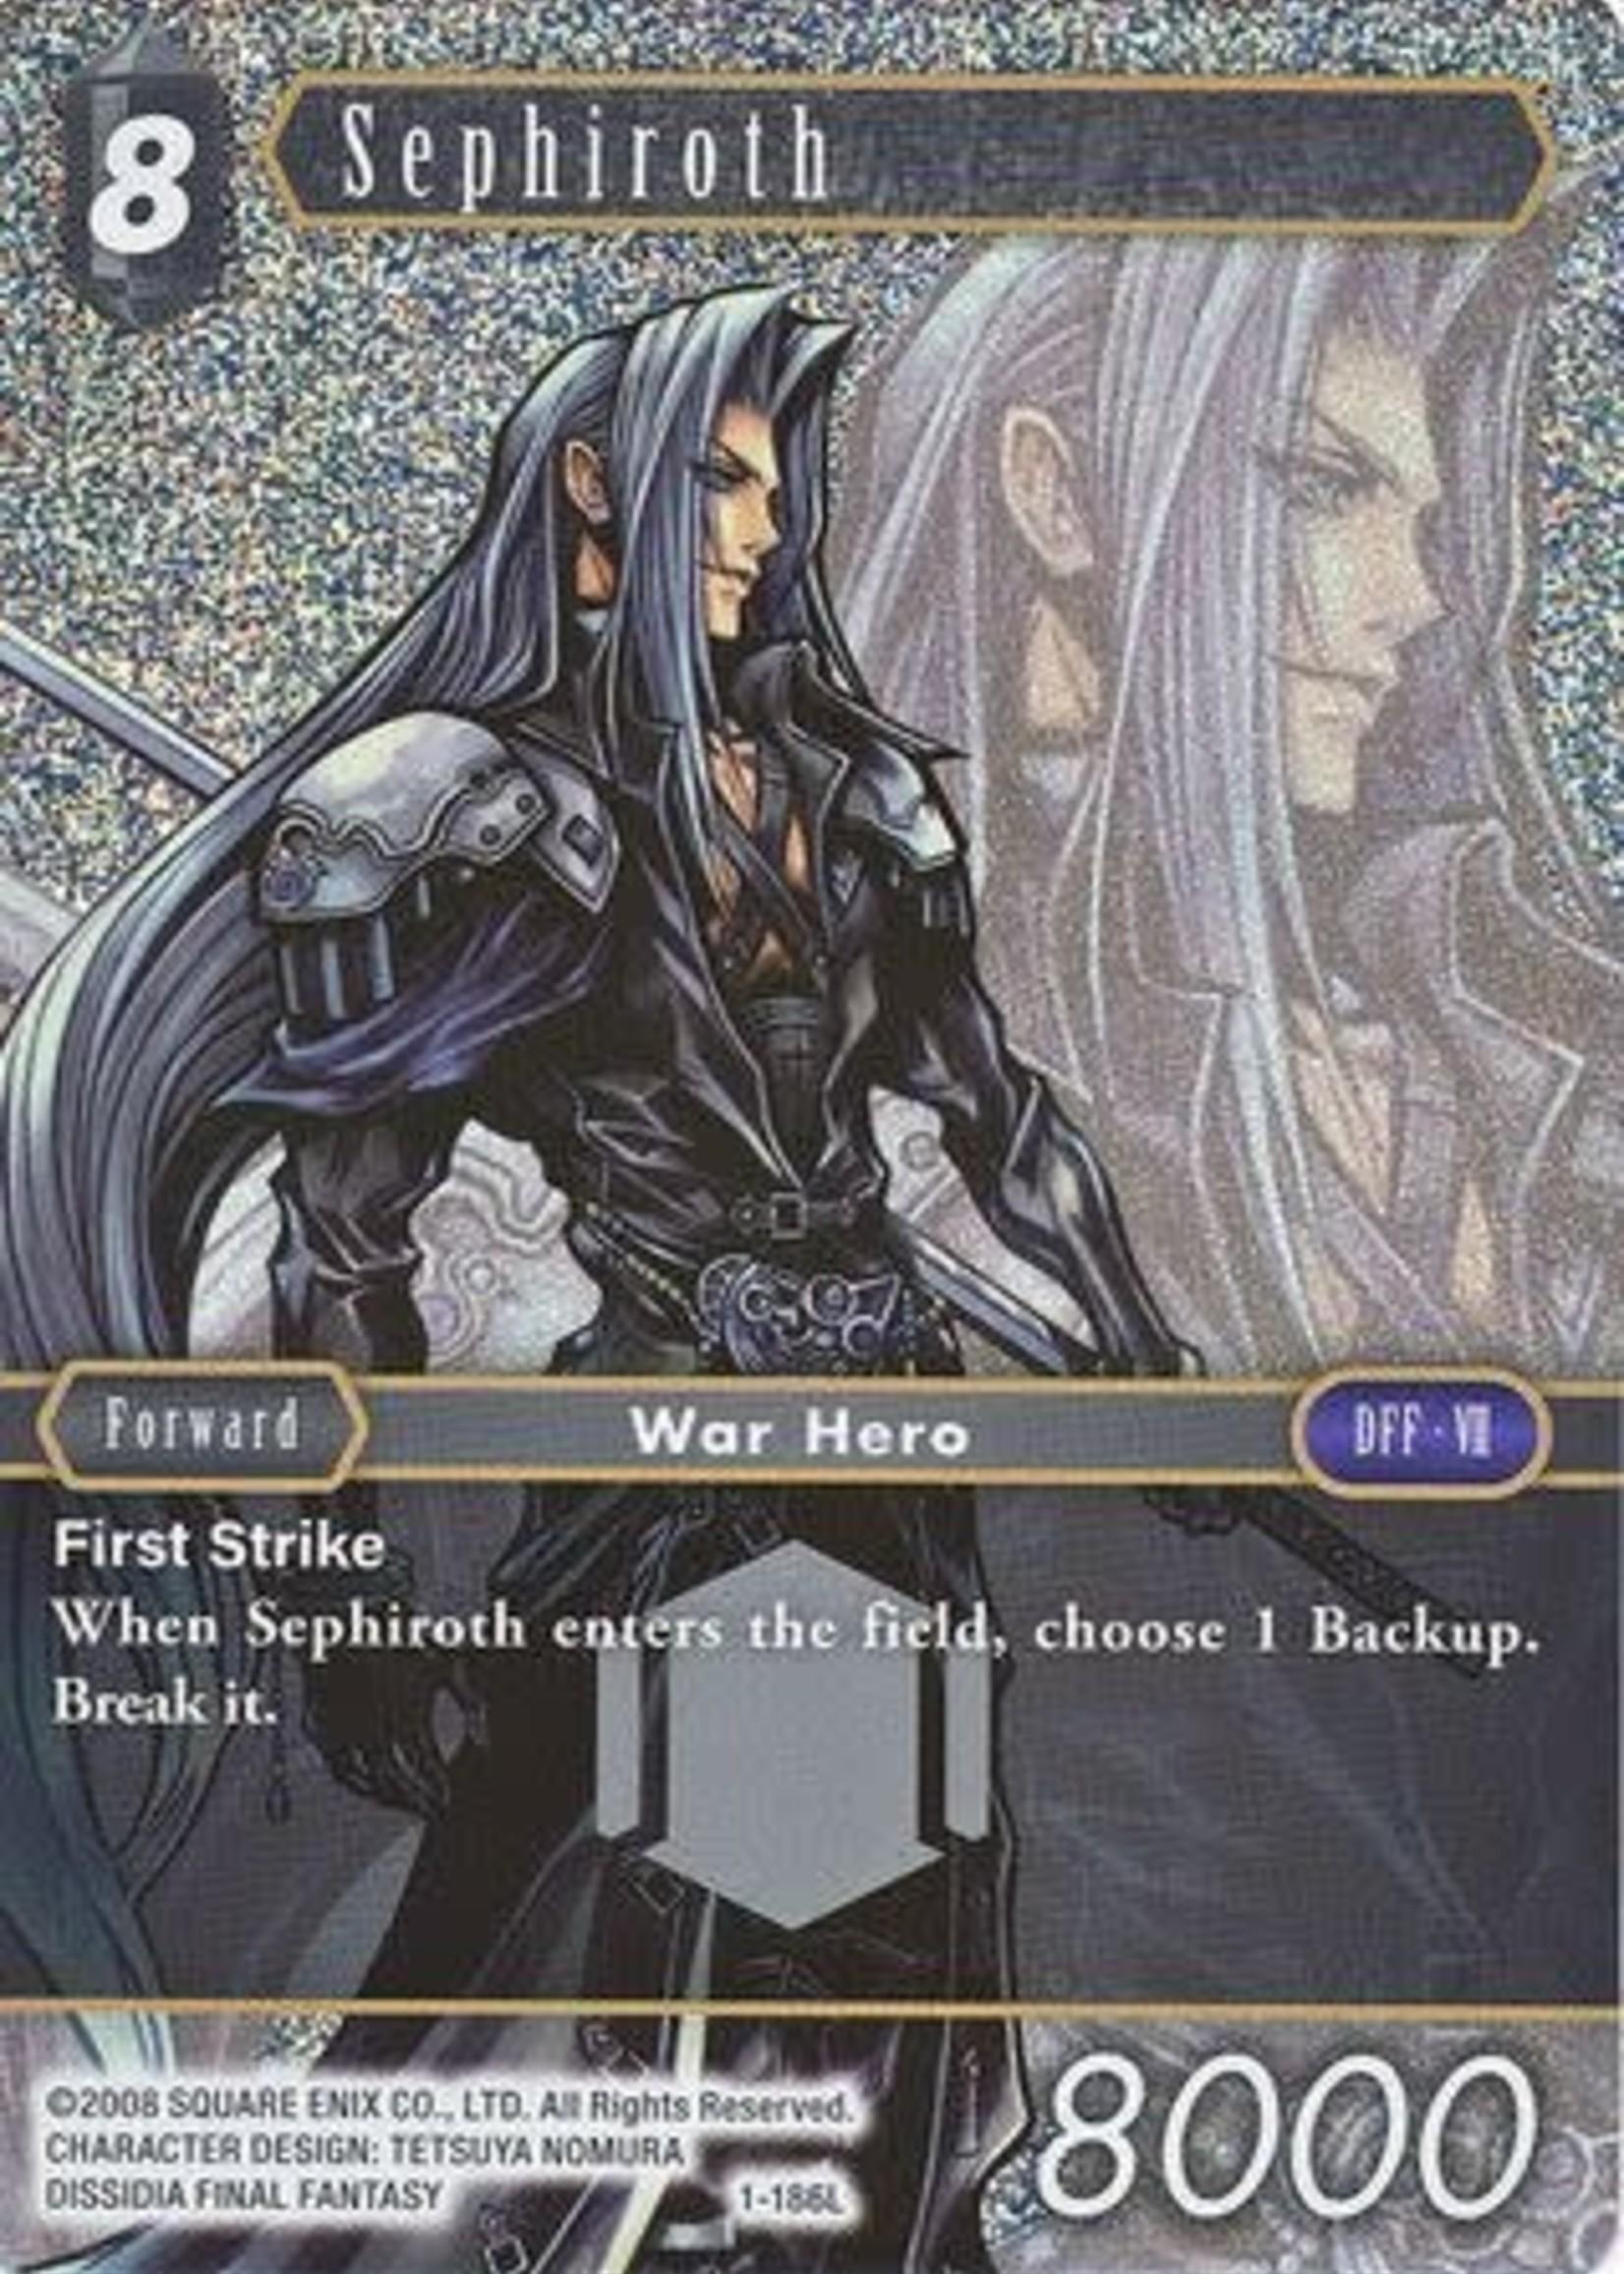 Sqaure Enix Sephiroth 1-186L (Foil) (NM)